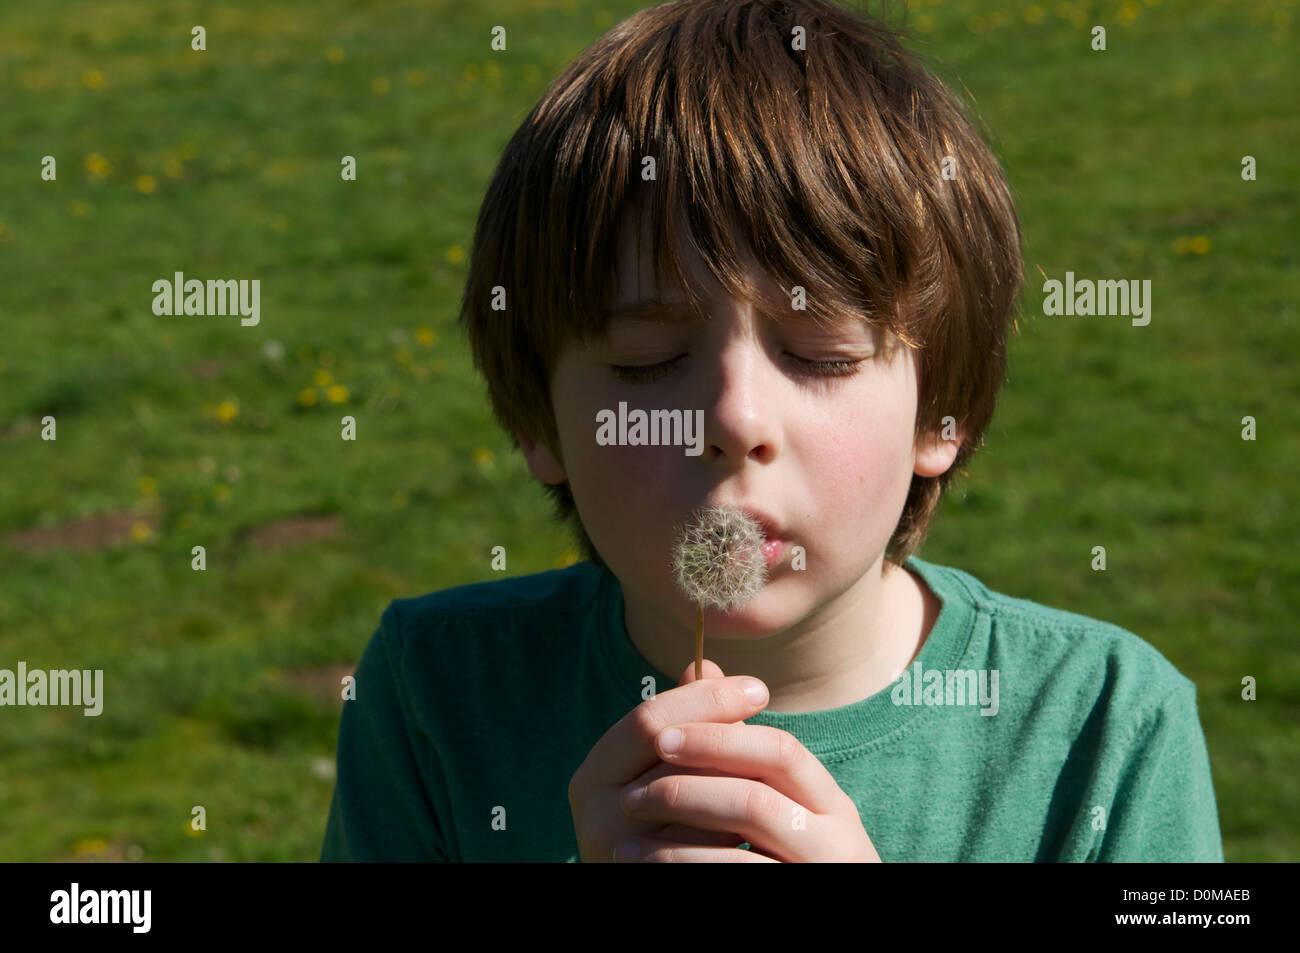 Boy makes wish on dandelion - Stock Image